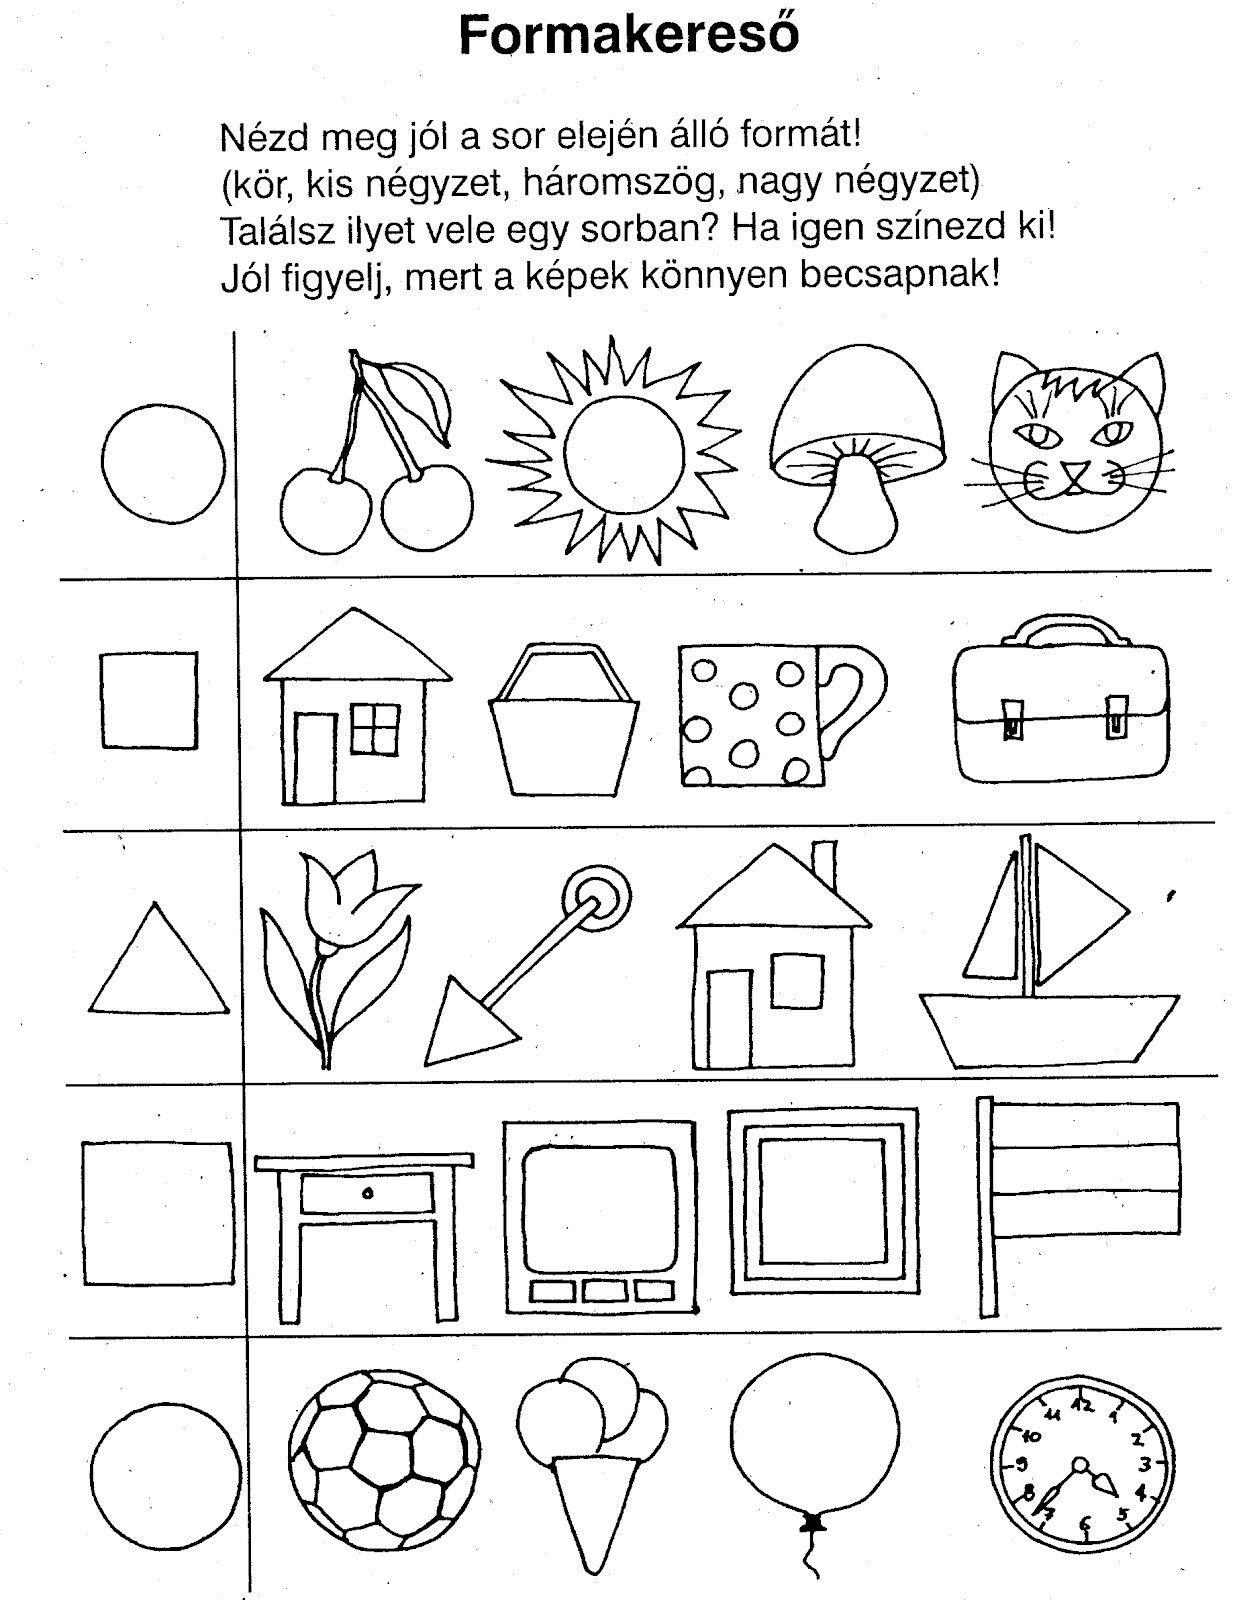 Pin von Monika Menczer auf i.é. | Pinterest | Kind